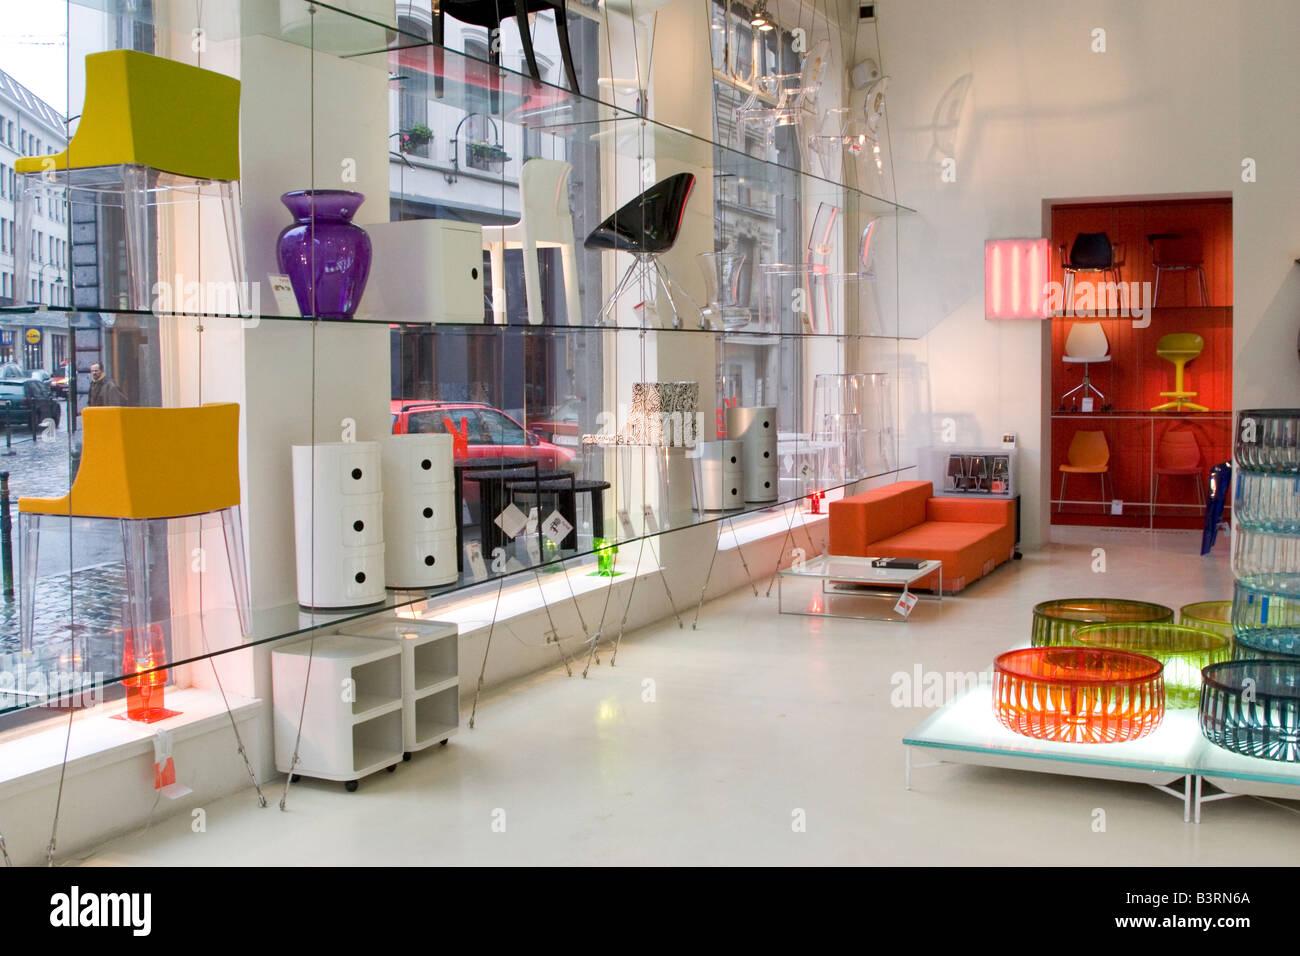 Gli interni alla moda store 39 kartell 39 vendita mobili di for Mobili kartell